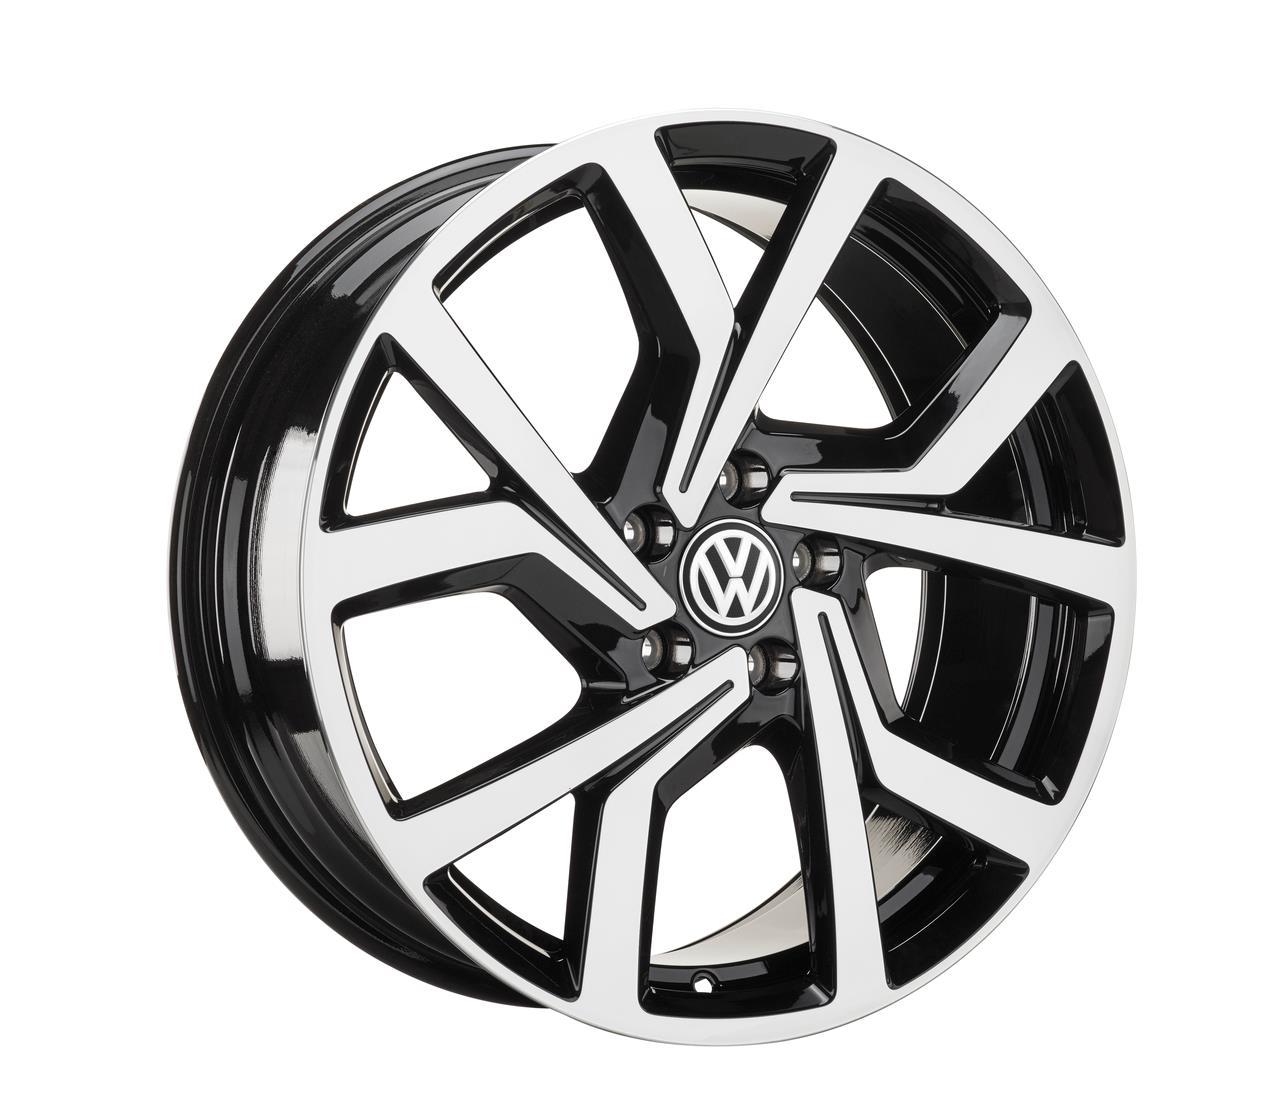 Dejlig VW Polo 18 Brescia, alufælge (UDSOLGT PÅ SHOPPEN) VX-06